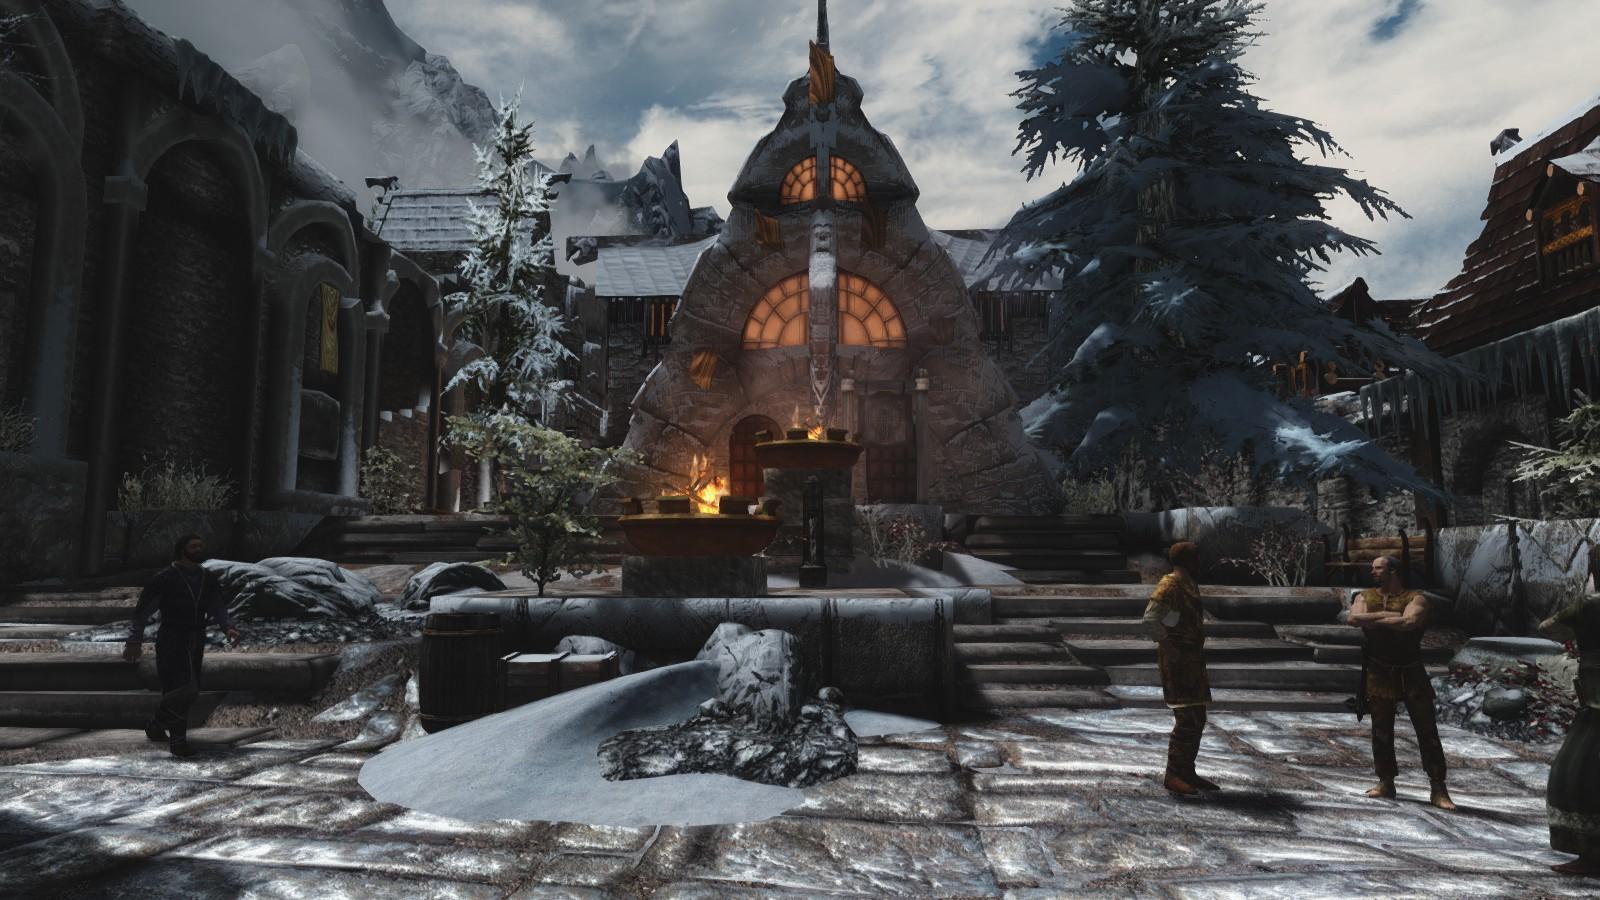 Dawn of Windhelm | The Elder Scrolls Mods Wiki | FANDOM